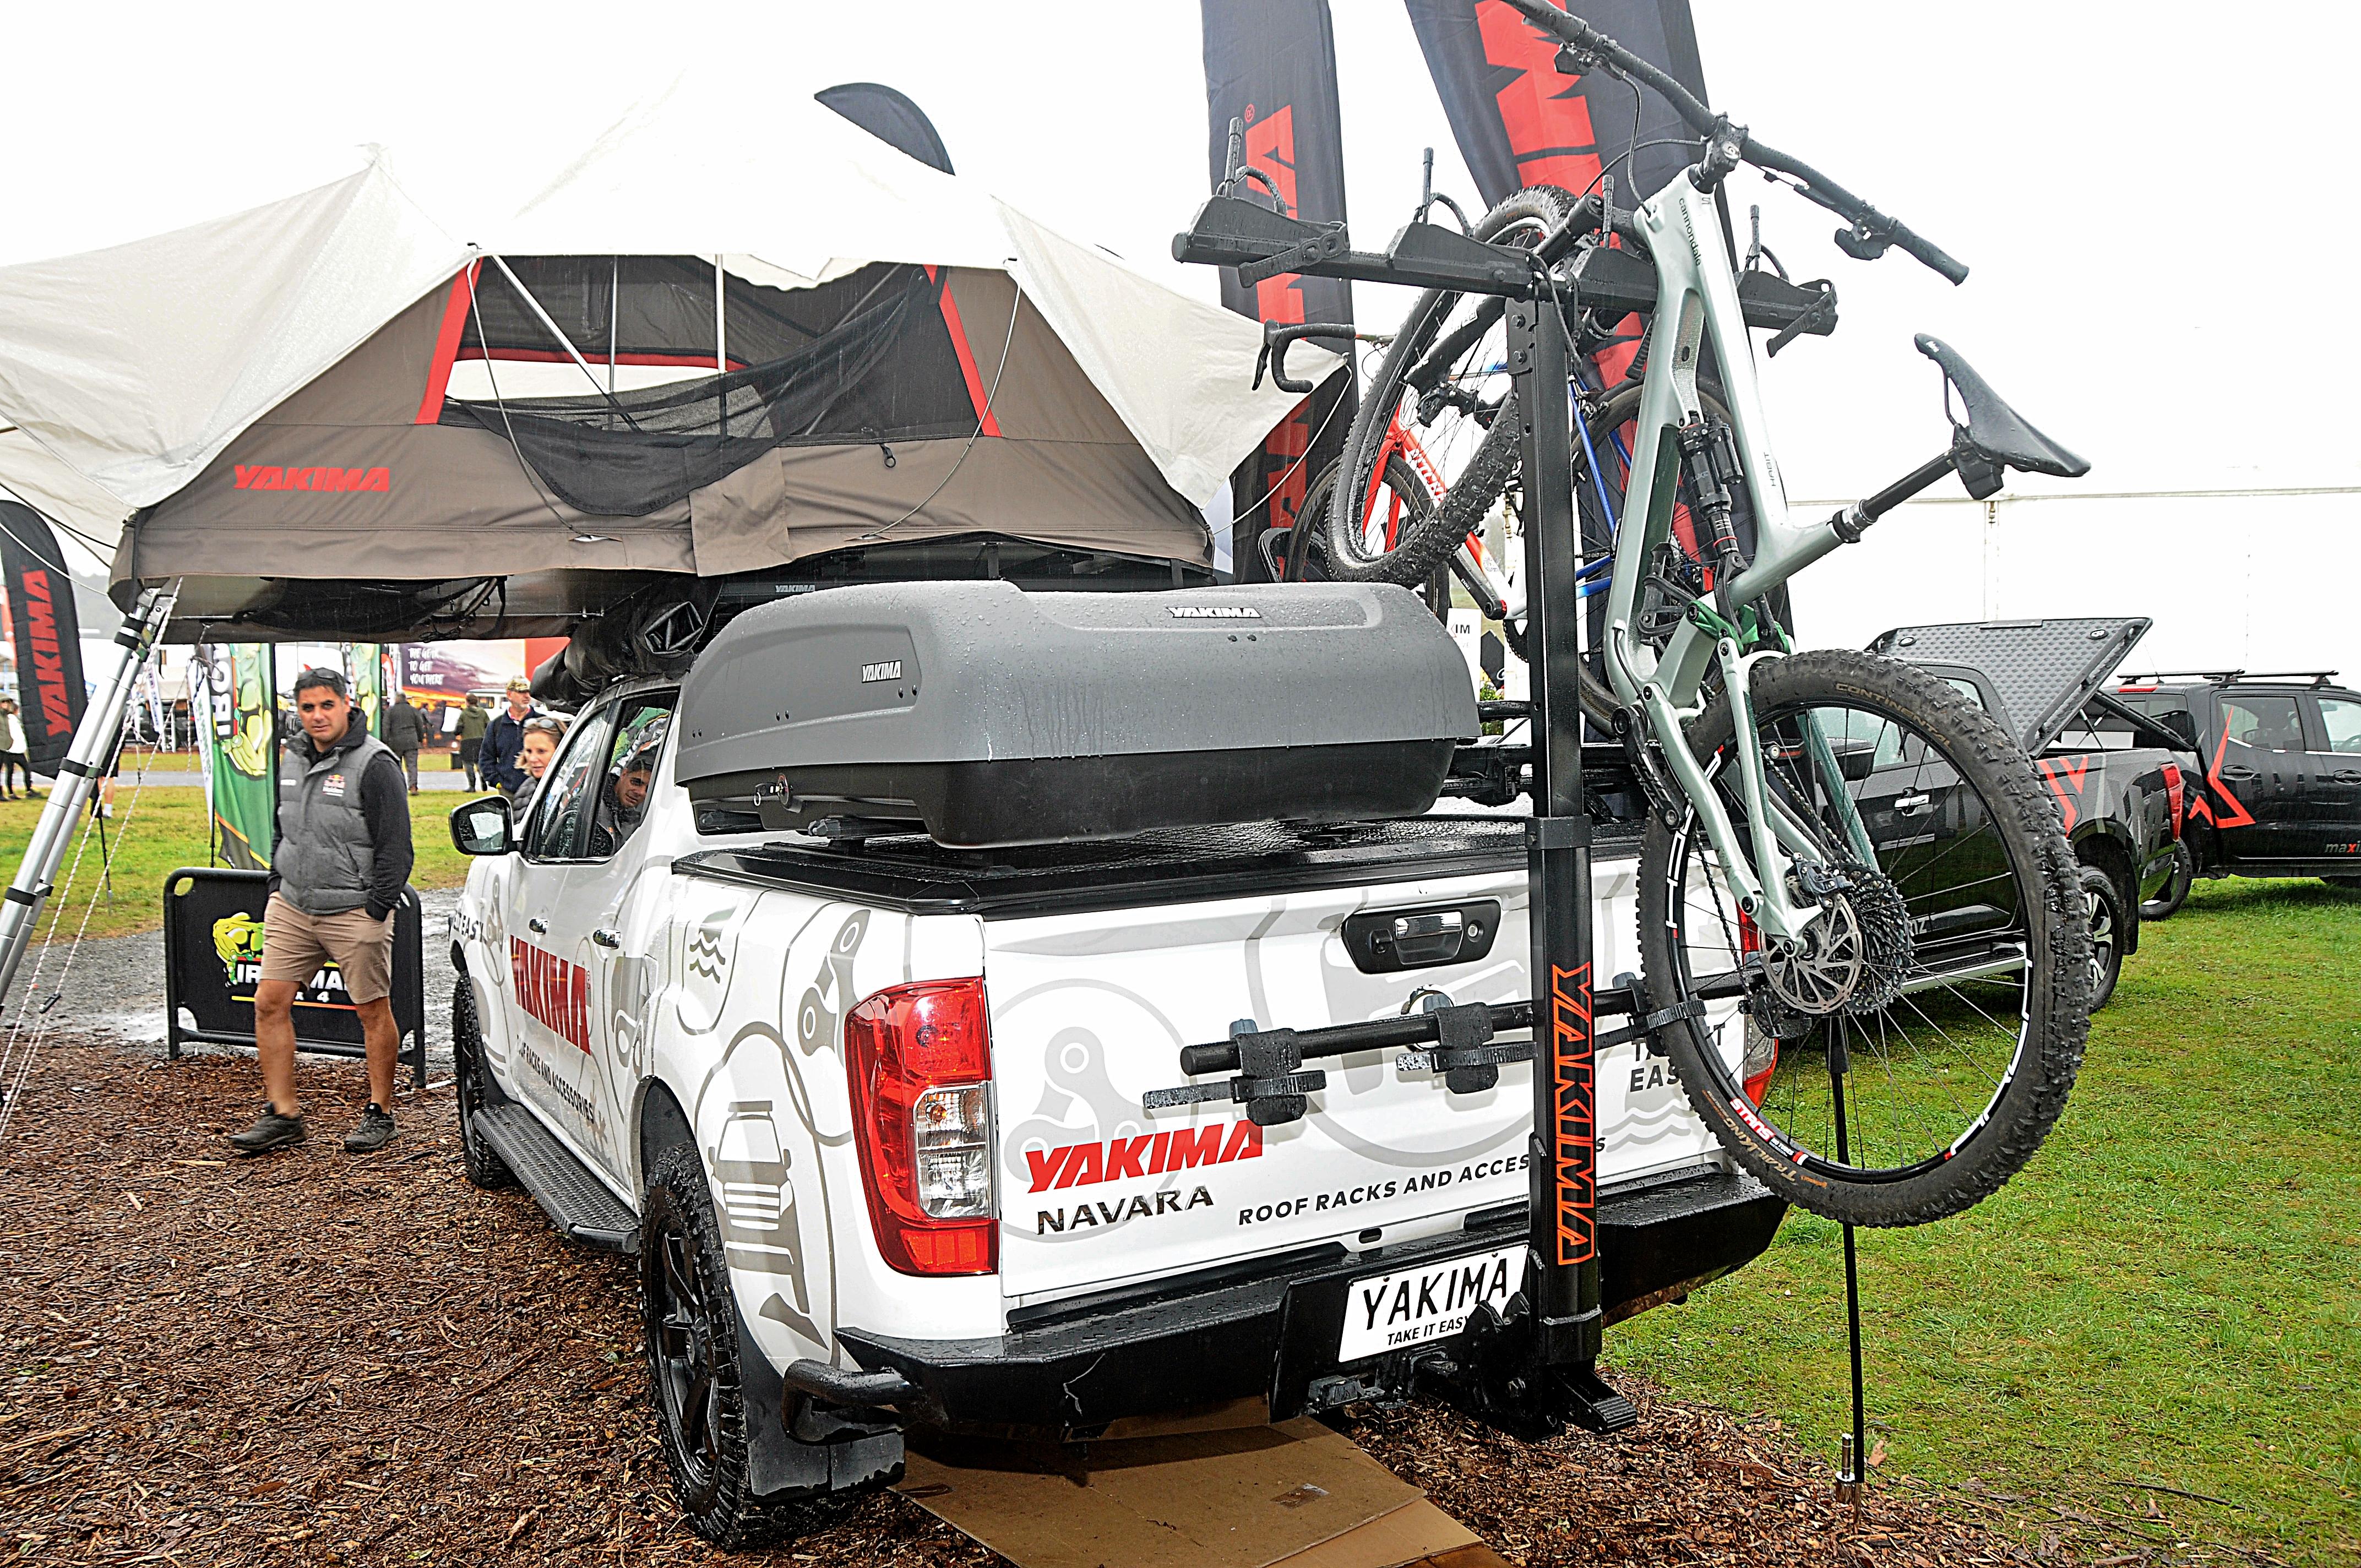 HangOver hitch style bike carrier on Nissan Navara